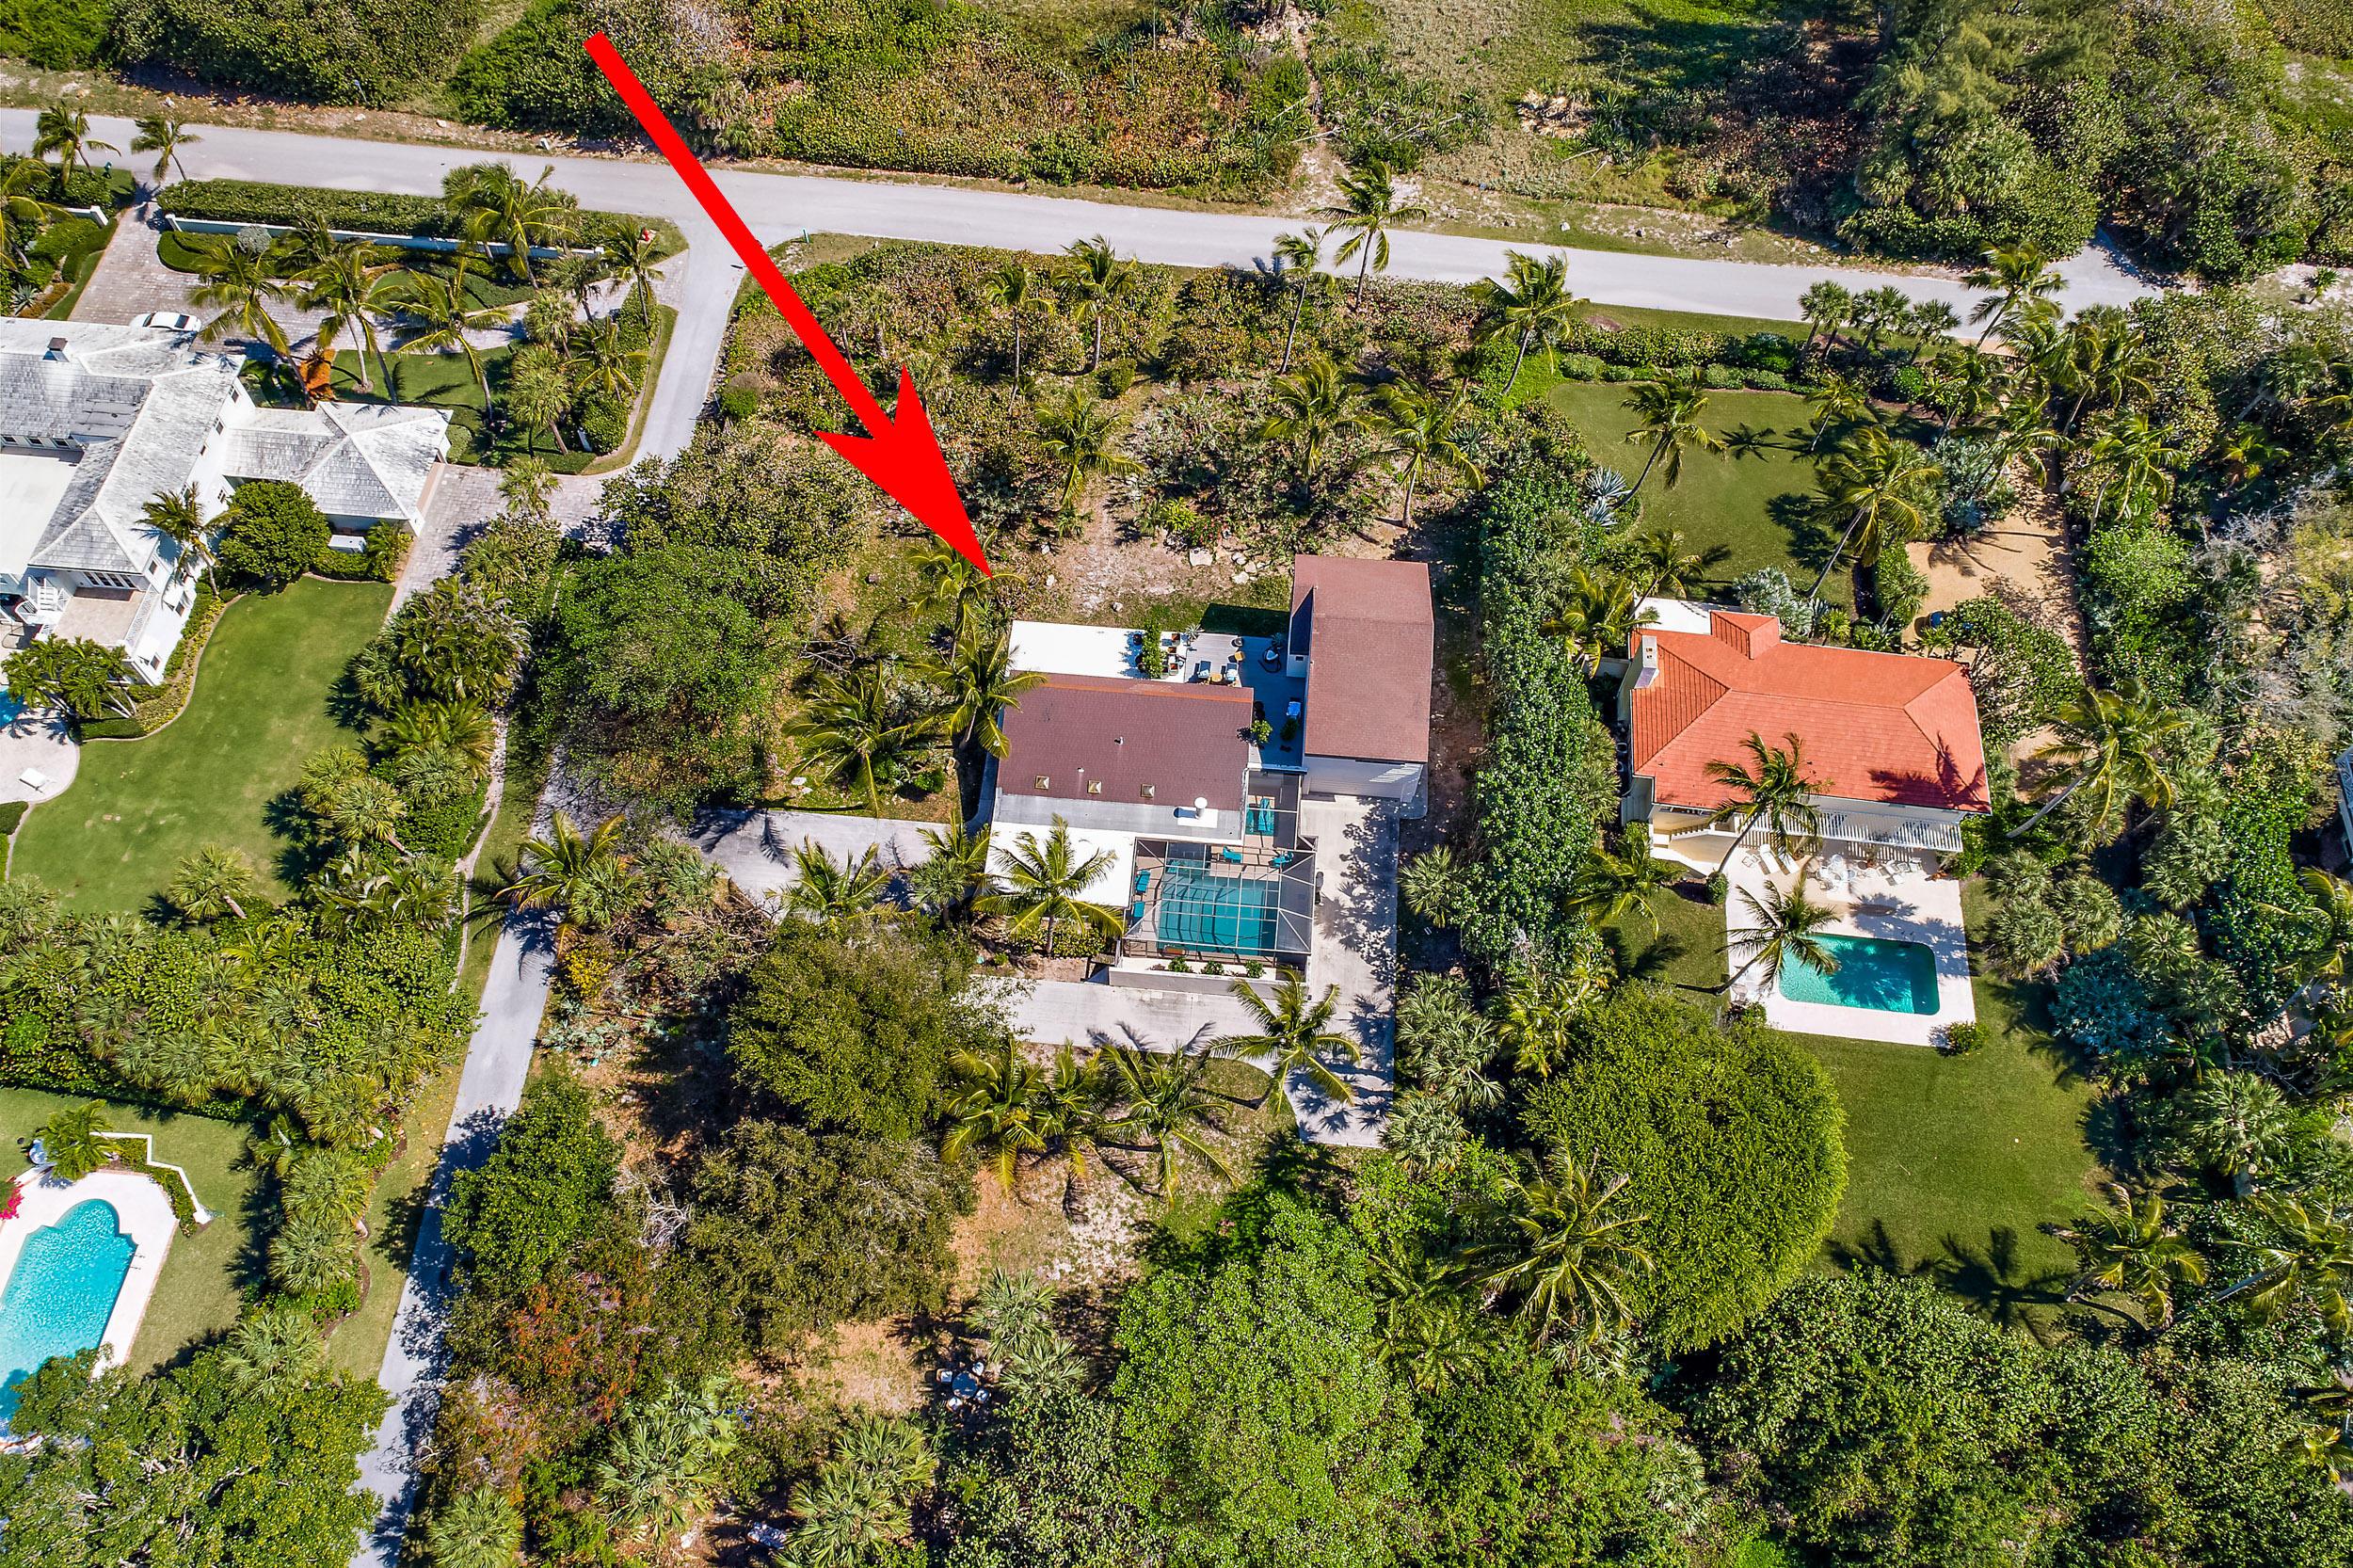 88 Beach Road, Hobe Sound, Florida 33455, 2 Bedrooms Bedrooms, ,3.1 BathroomsBathrooms,A,Single family,Beach,RX-10509853